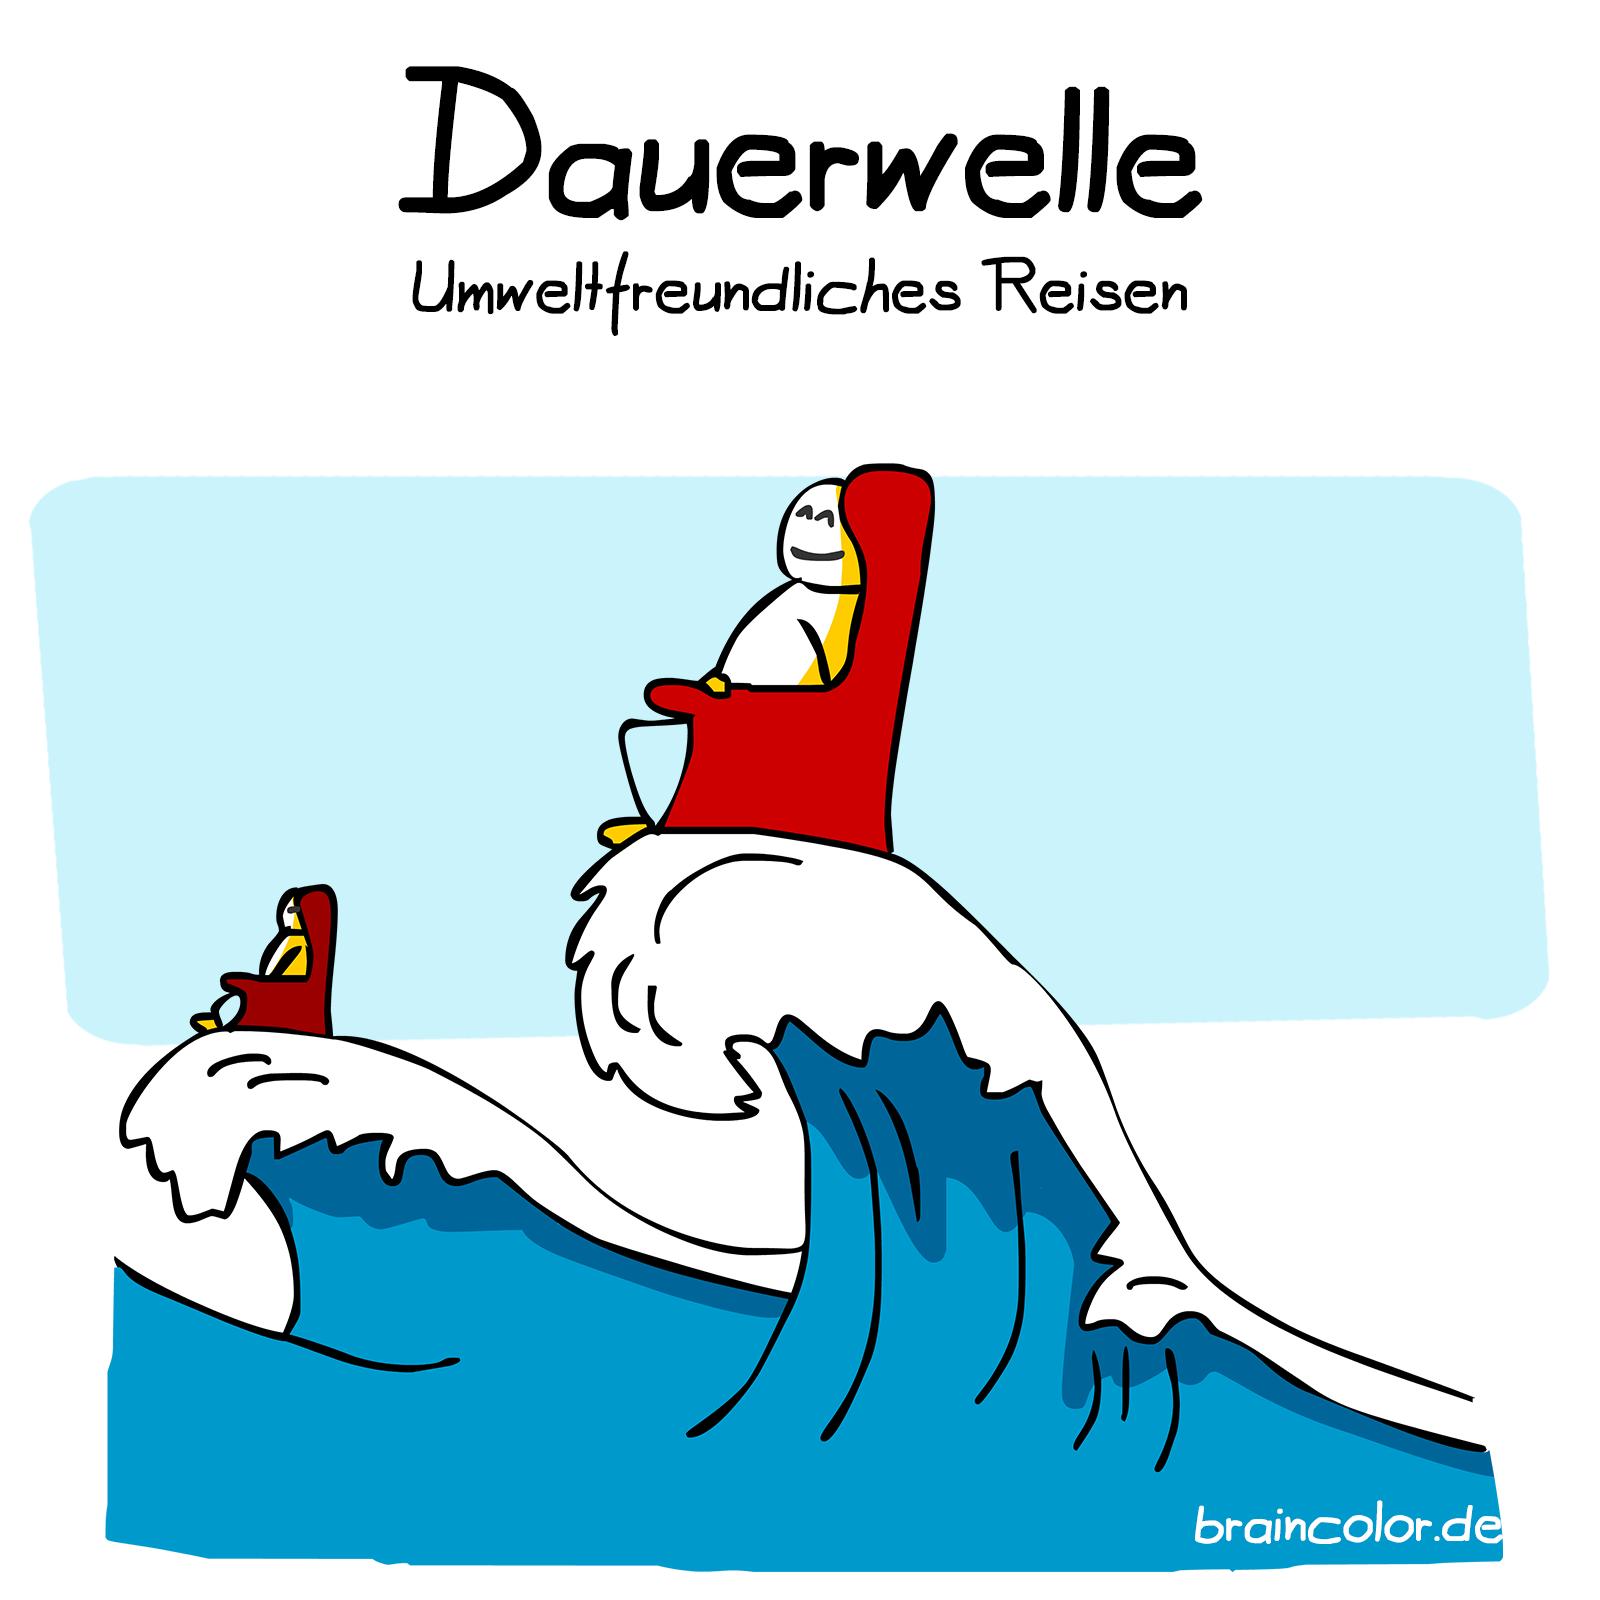 dauerwelle